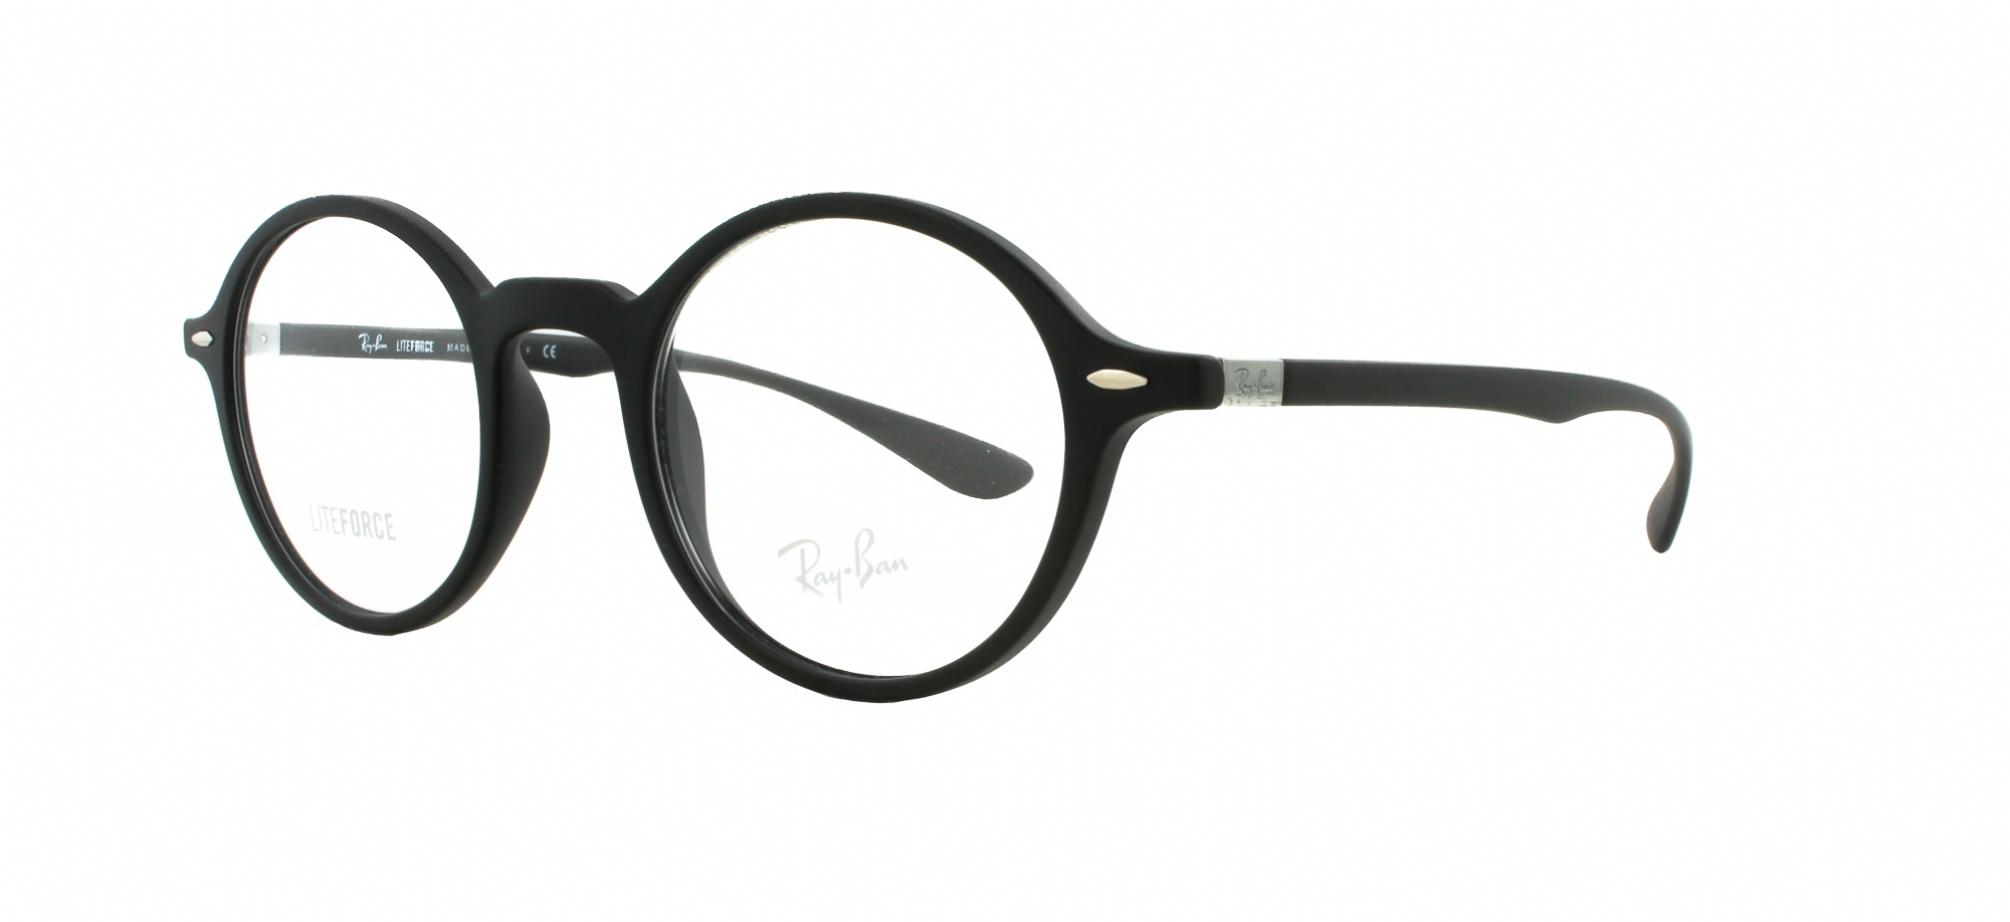 55de78a30e Original Ray Ban Sunglasses Made In Usa